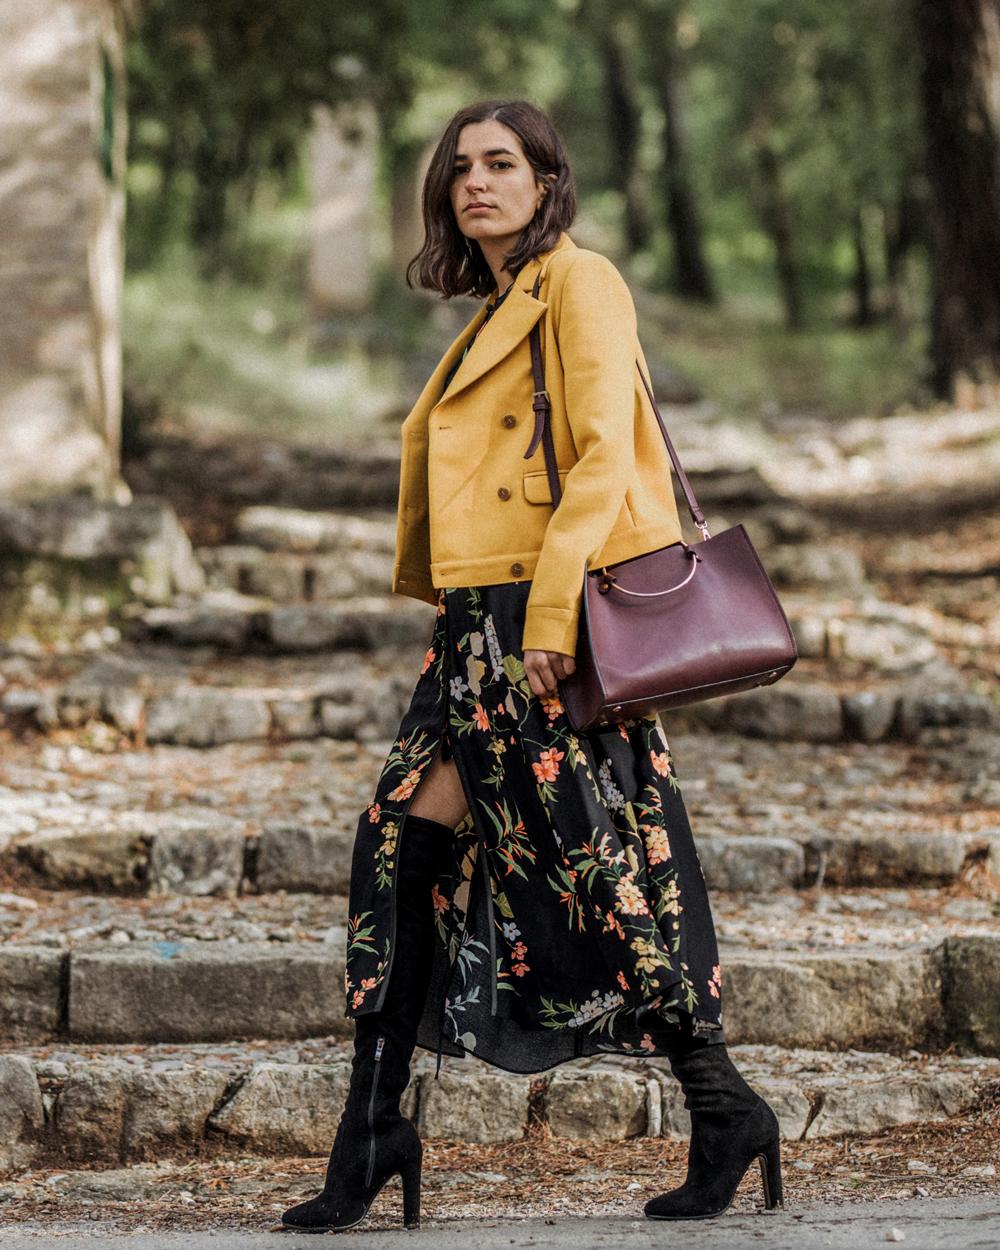 A Yellow Jacket And A Floral Dress Aria Di Bari